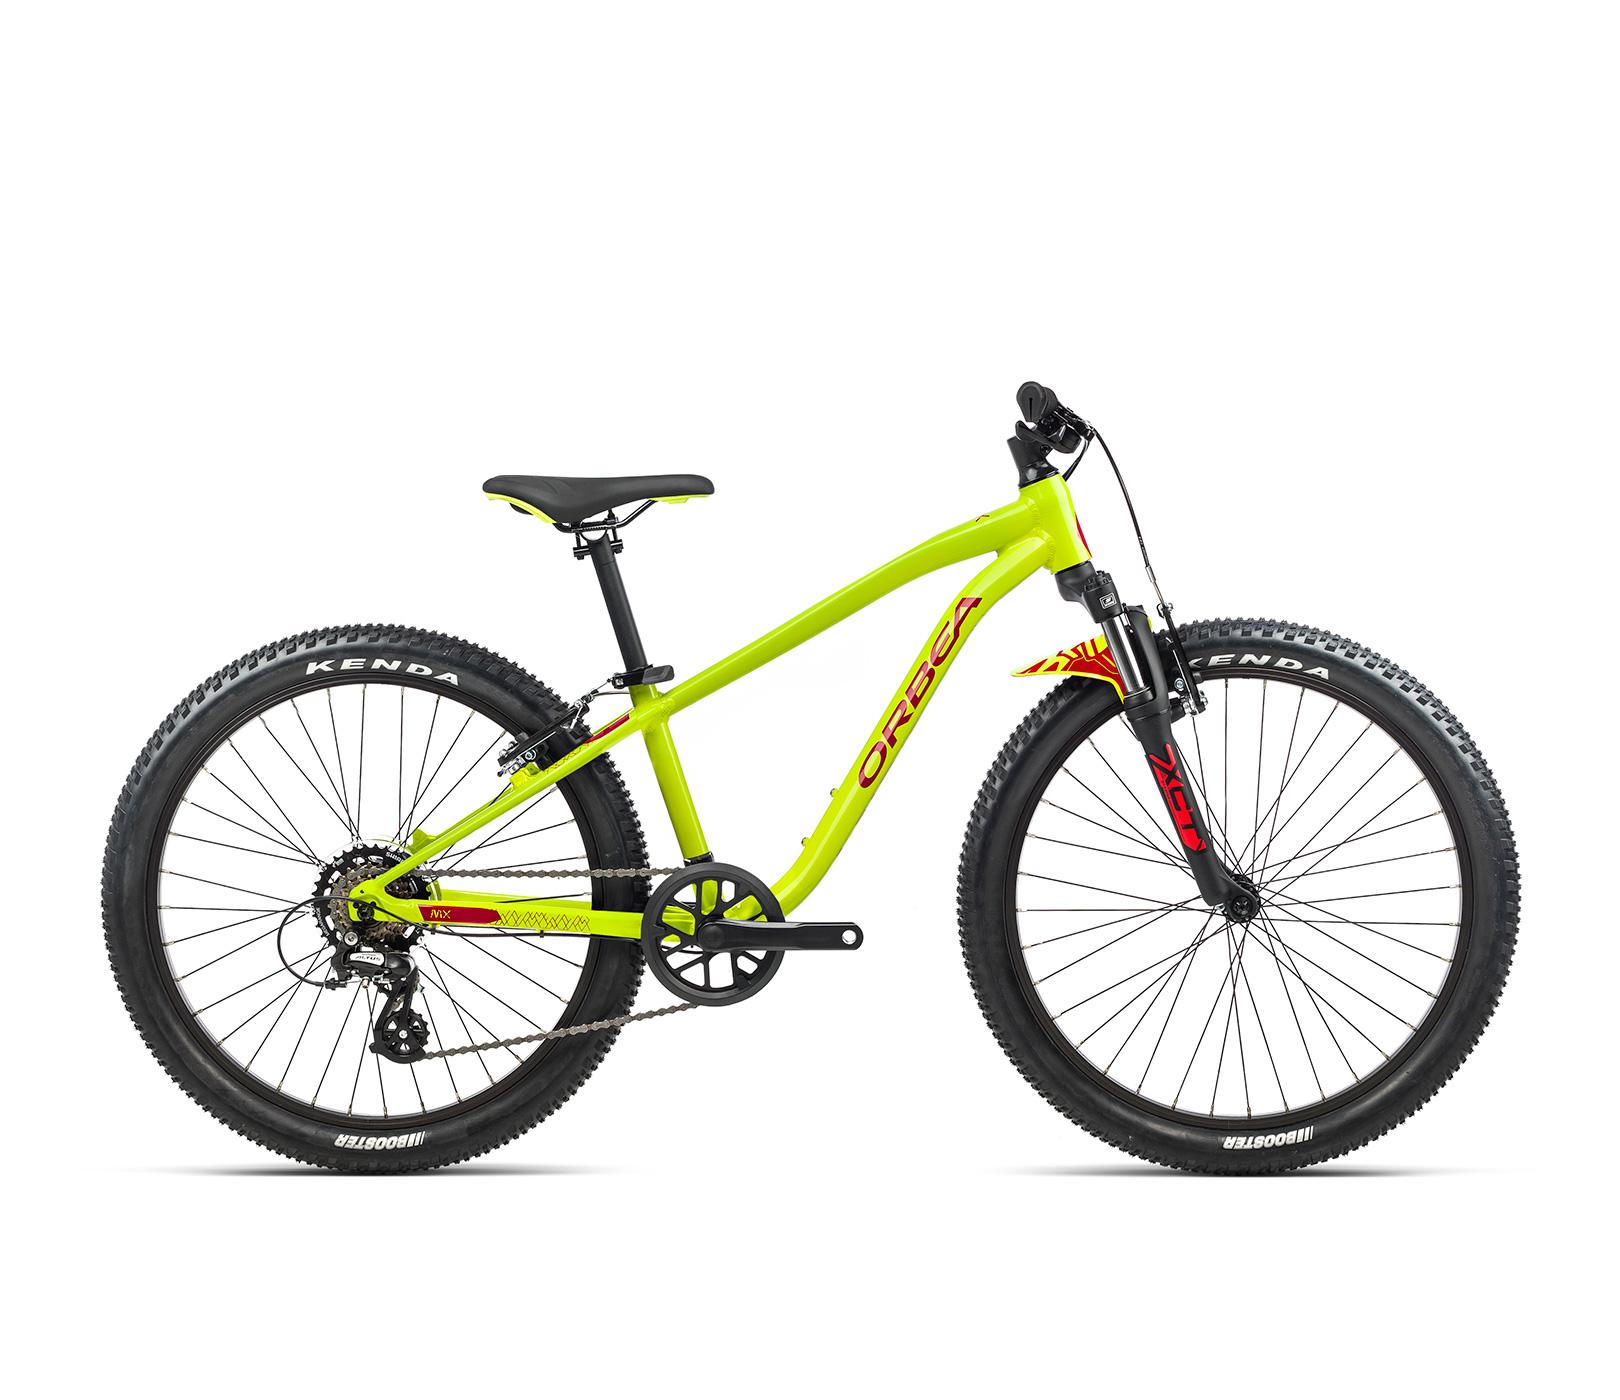 Orbea MX24 XC 24 Inch Kids Mountain Bike 2021 Lime/Watermelon